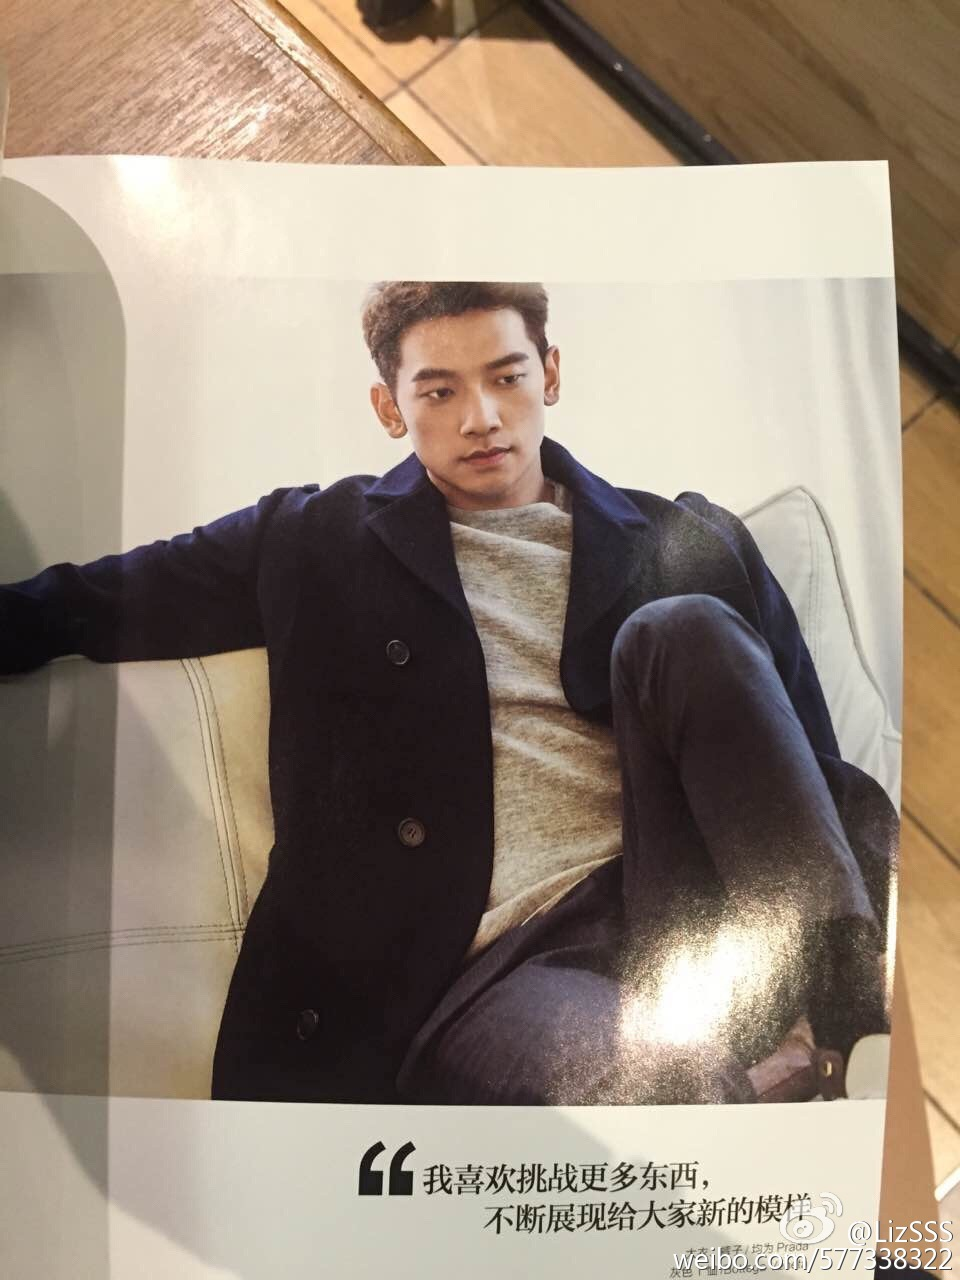 Rain 男人风尚 Leon Magazine _c0047605_7575148.jpg